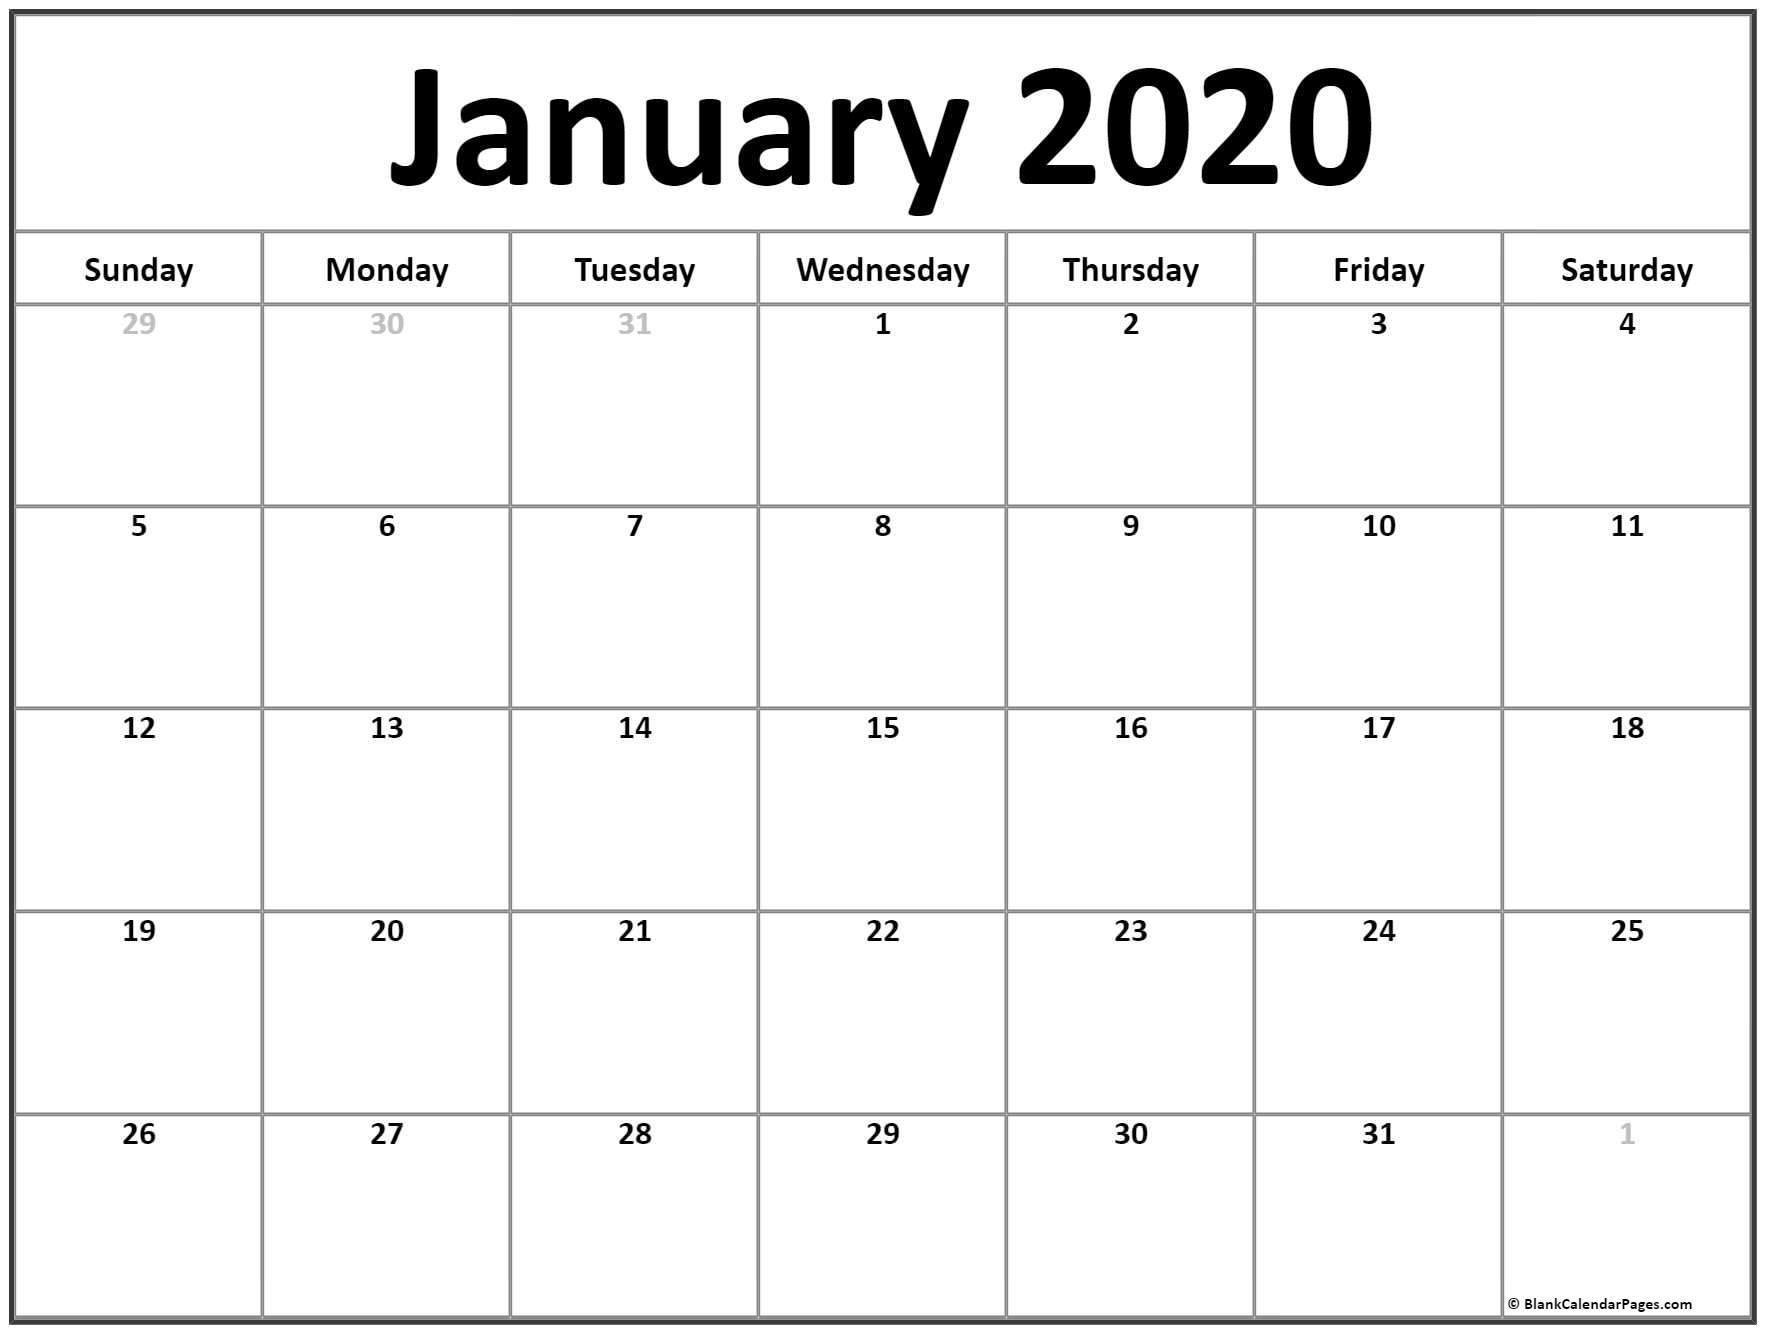 Free January 2020 Printable Calendar